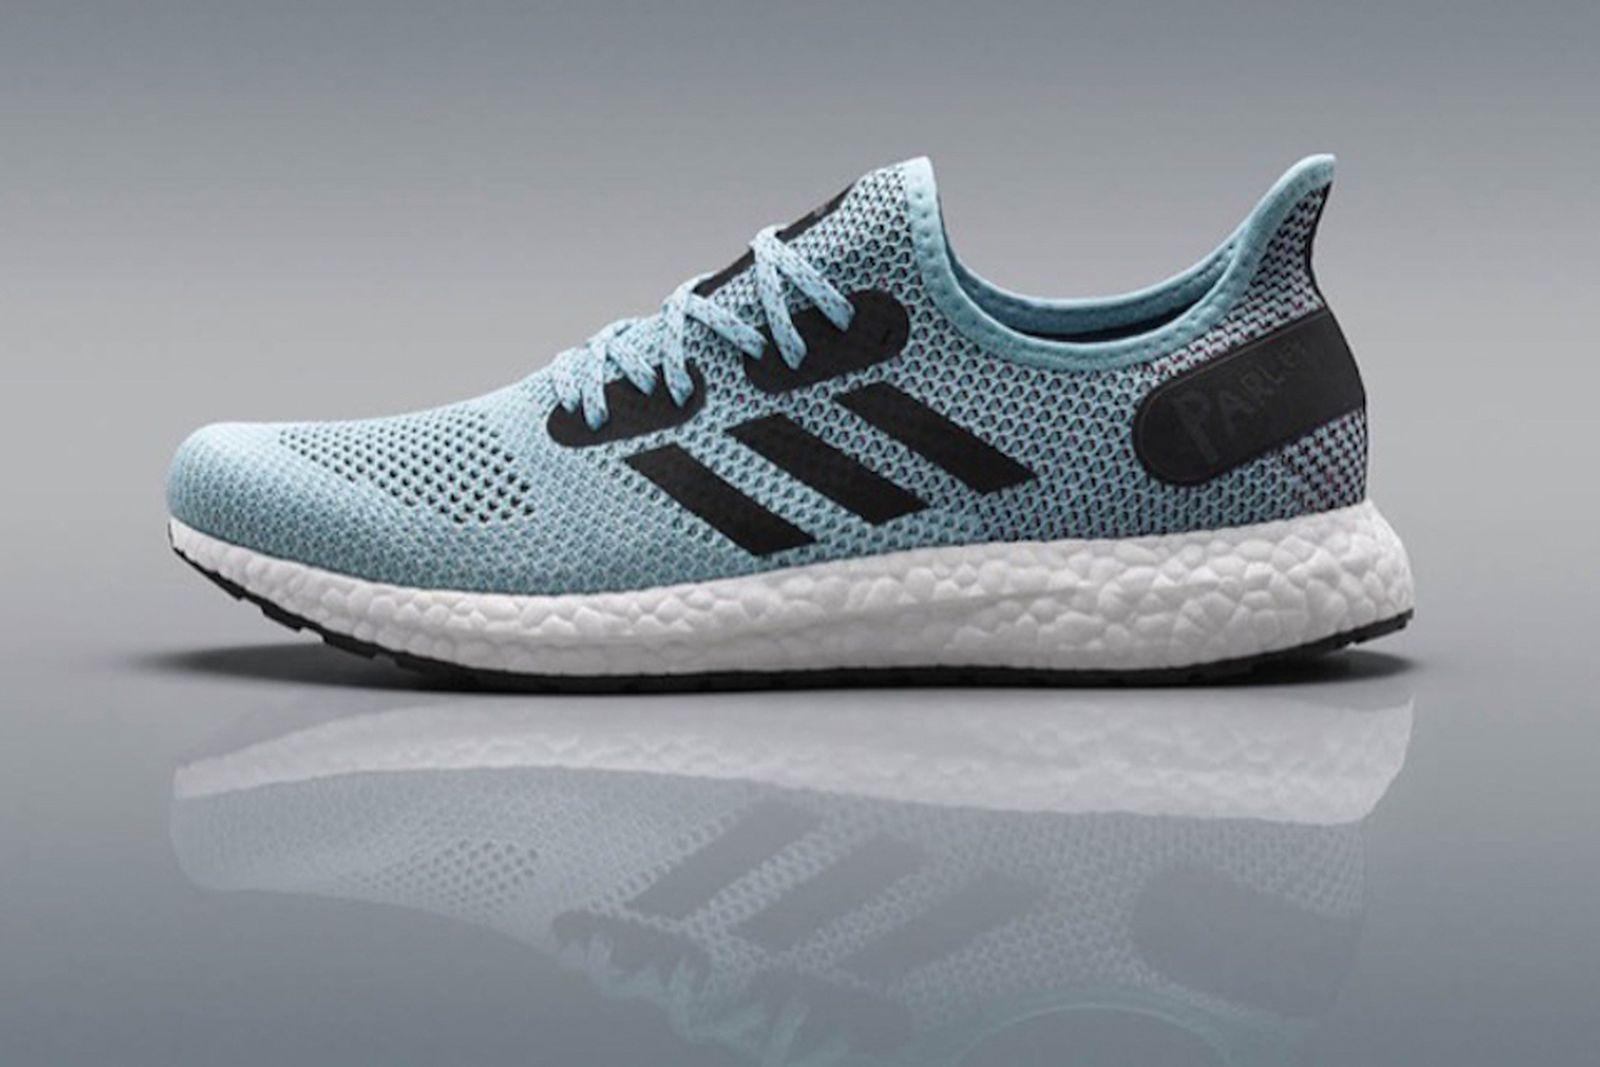 adidas-am4la-release-date-price-01